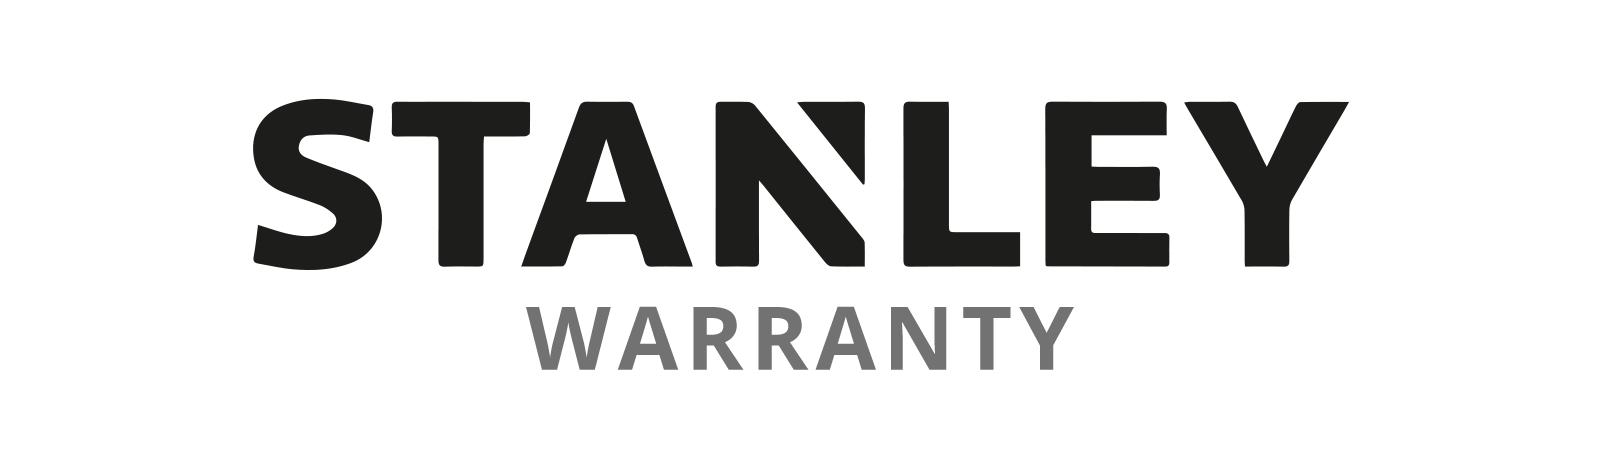 stanley-warranty.png